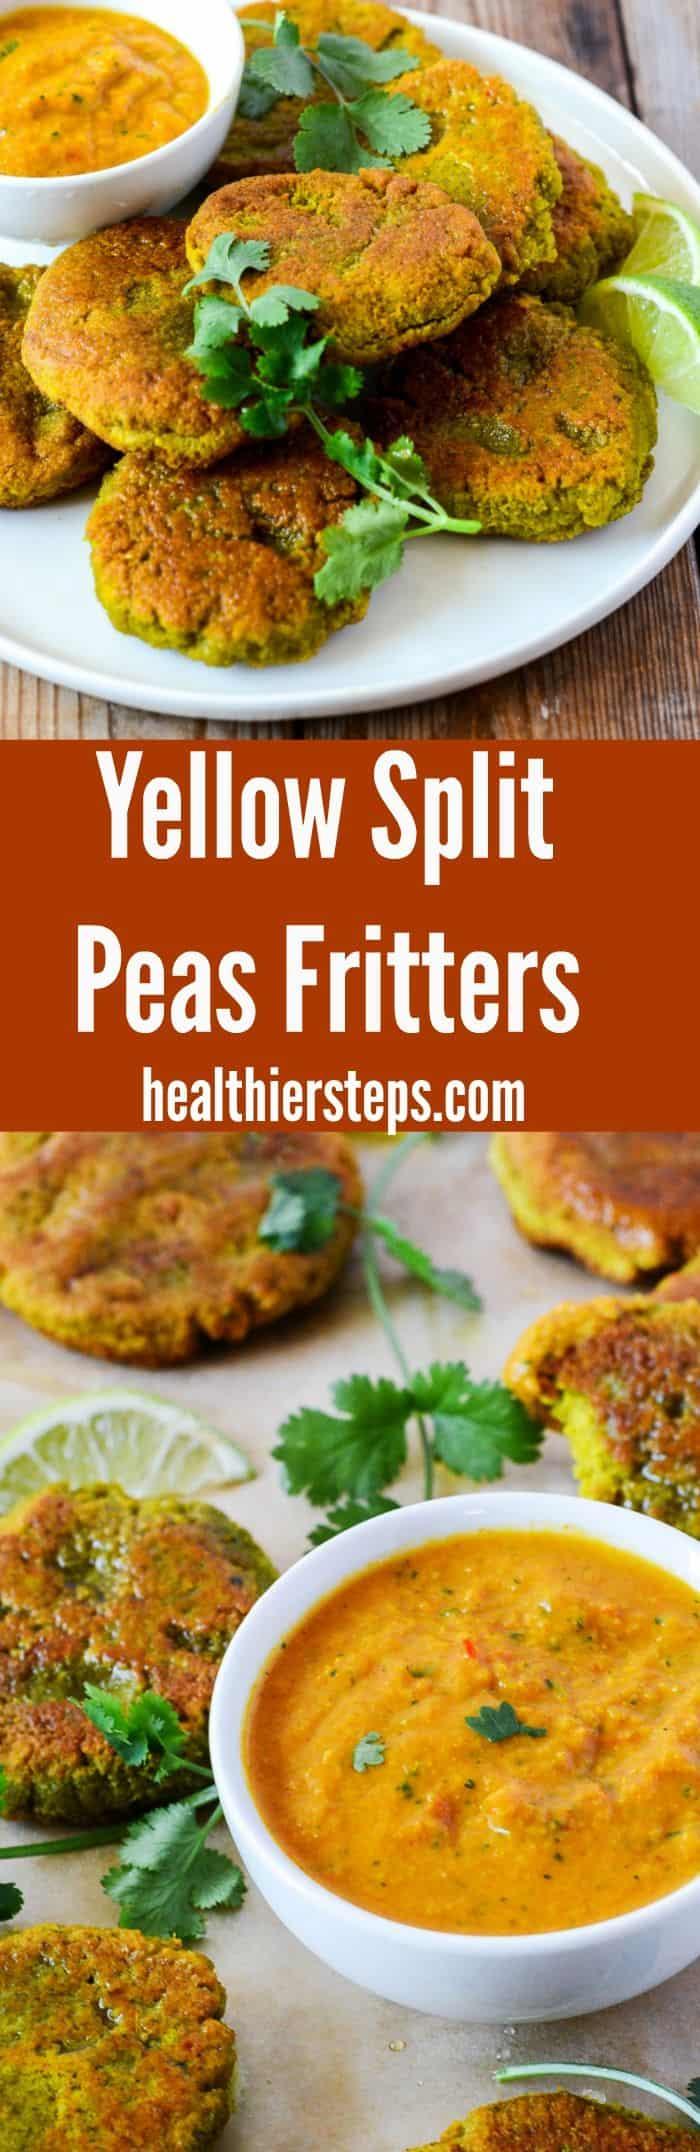 Yellow Split Peas Fritters